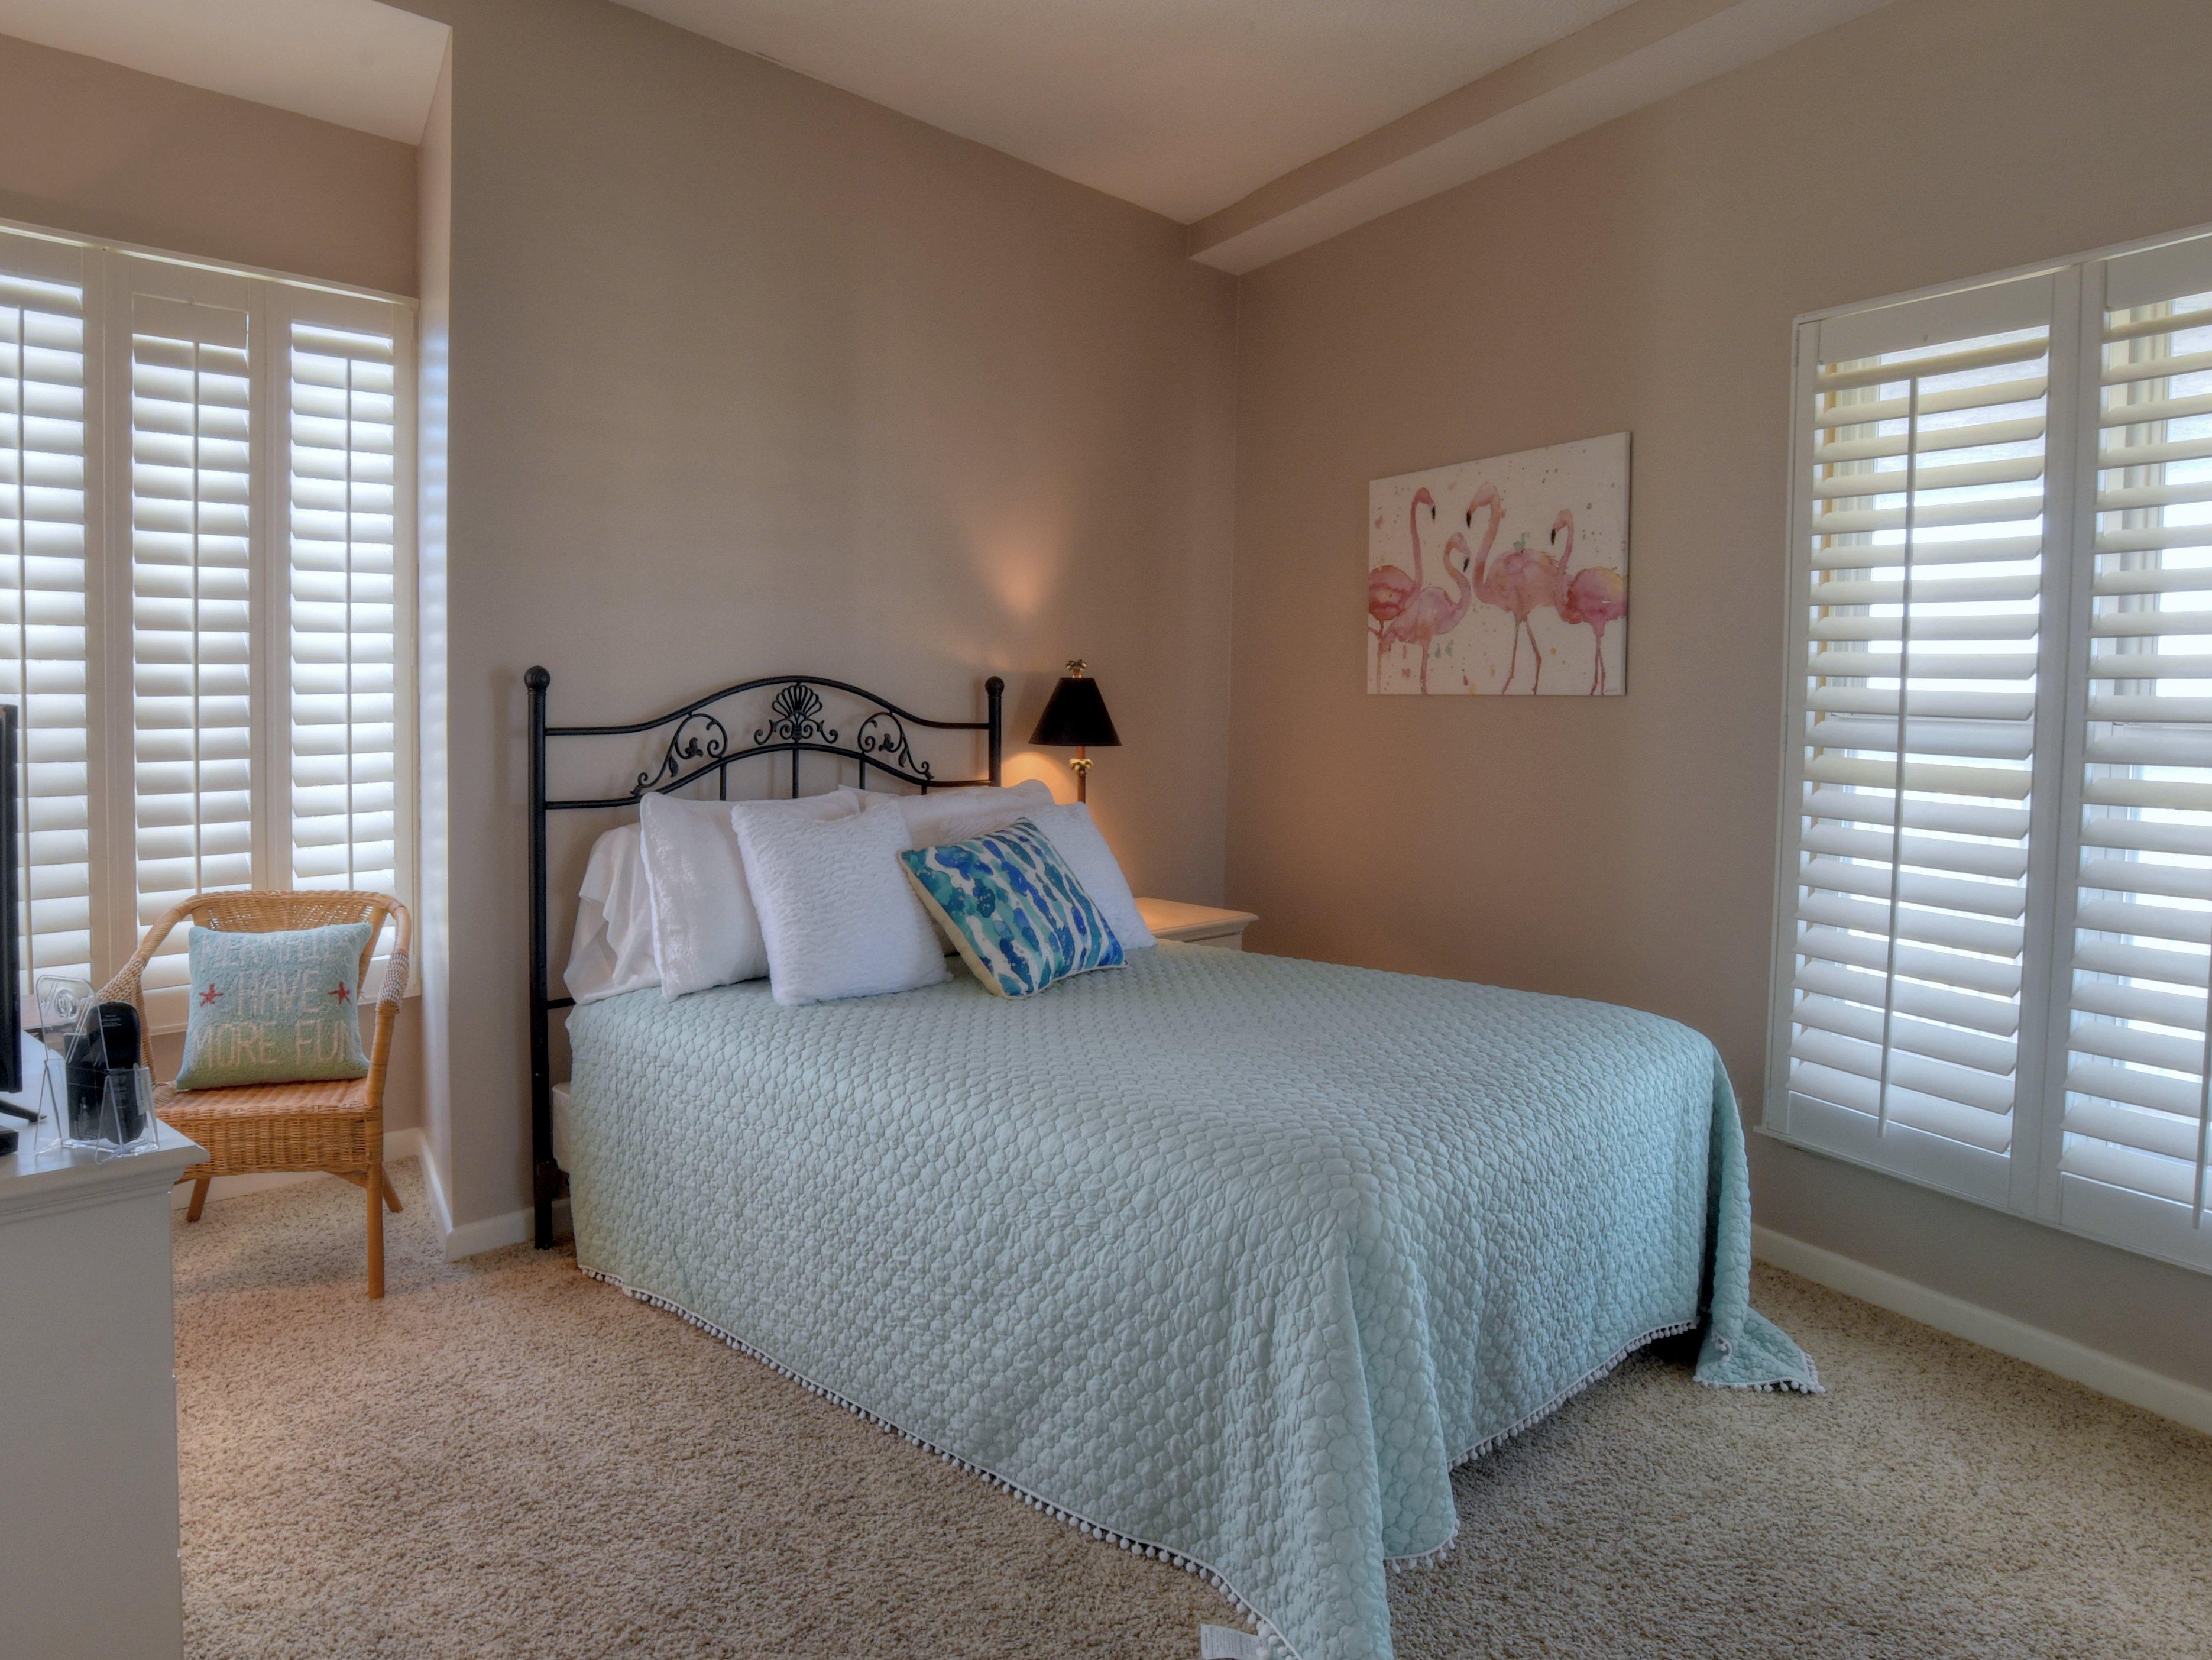 4362 Beachside Two Condo rental in Beachside Towers at Sandestin in Destin Florida - #16